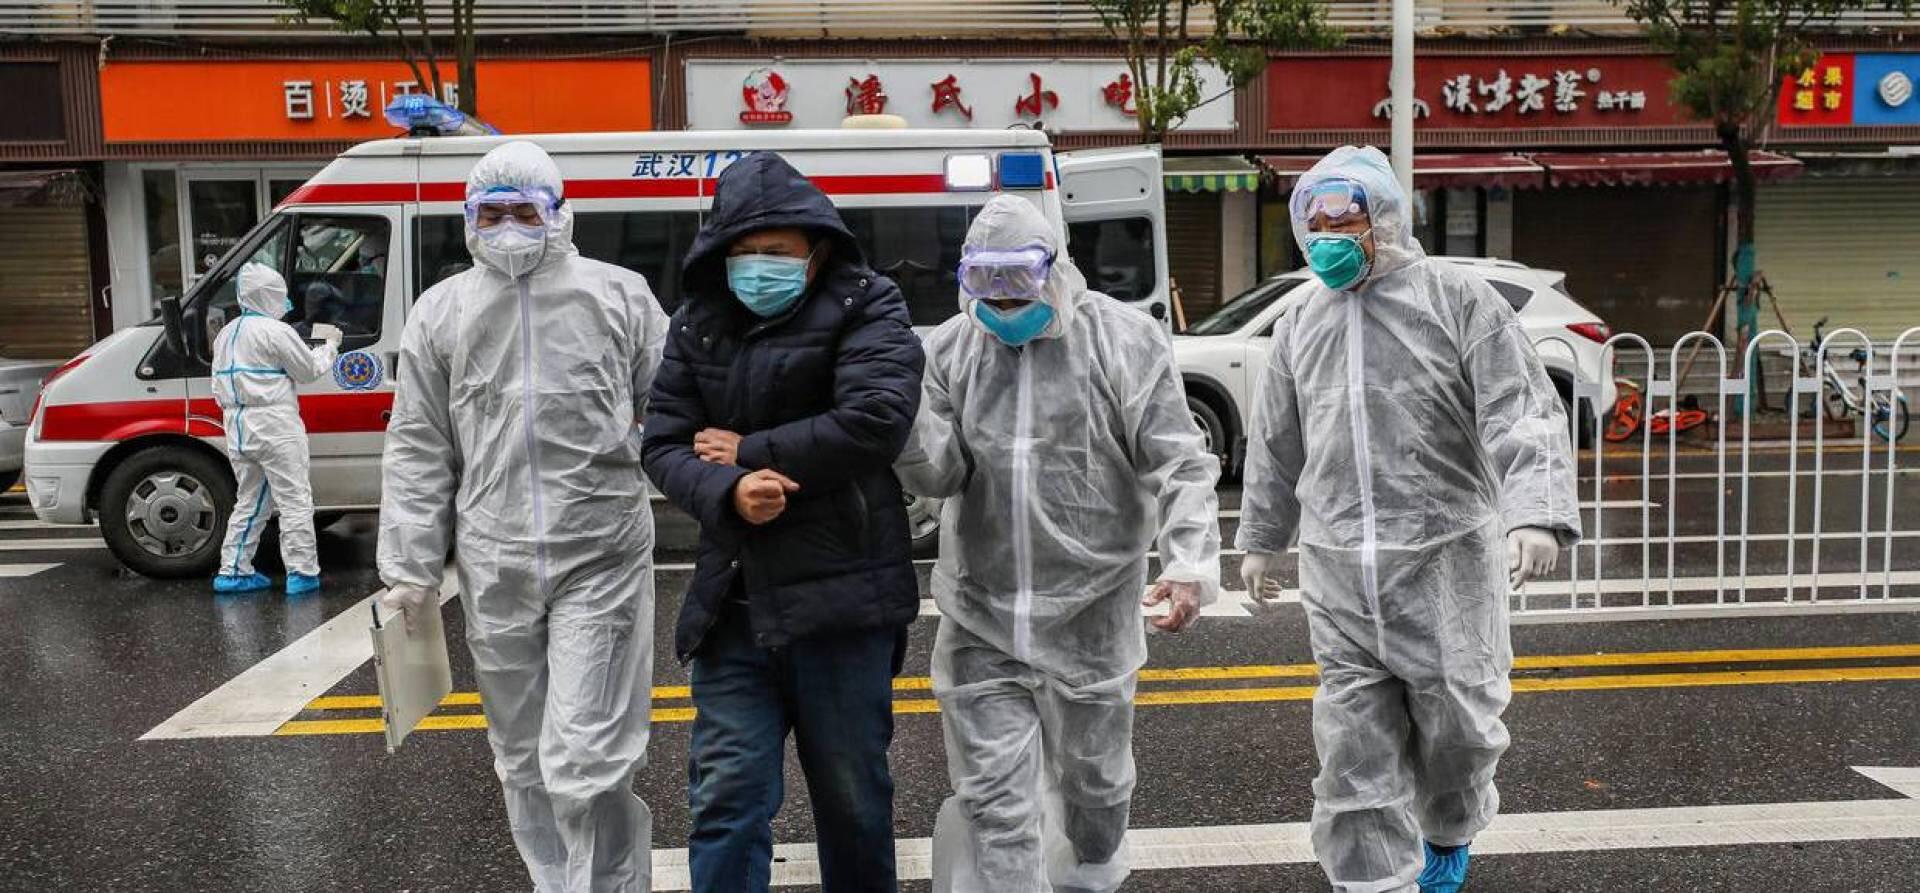 img 8983 - الصين: عدد المصابين بفيروس كورونا أكثر من 9 آلاف